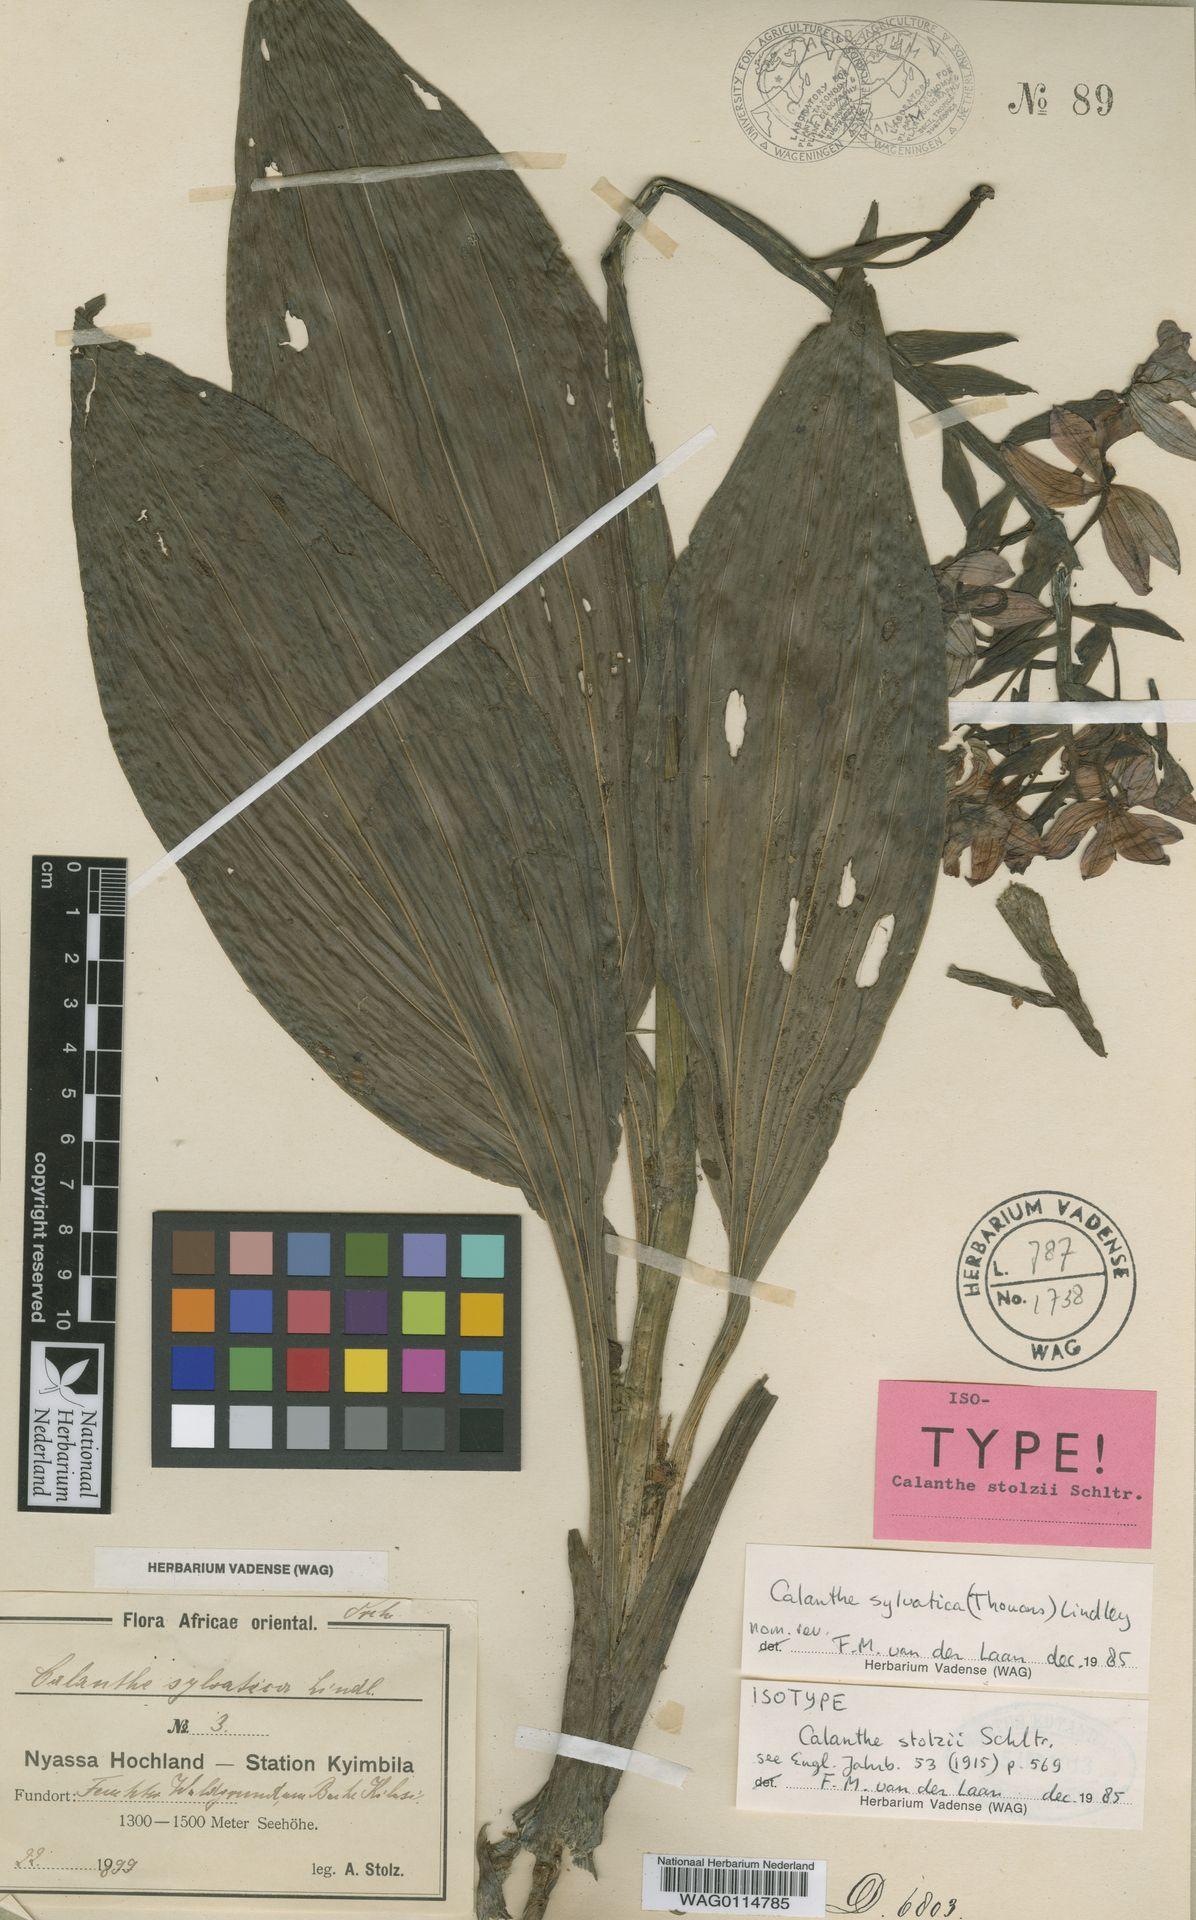 WAG0114785 | Calanthe sylvatica (Thouars) Lindl.